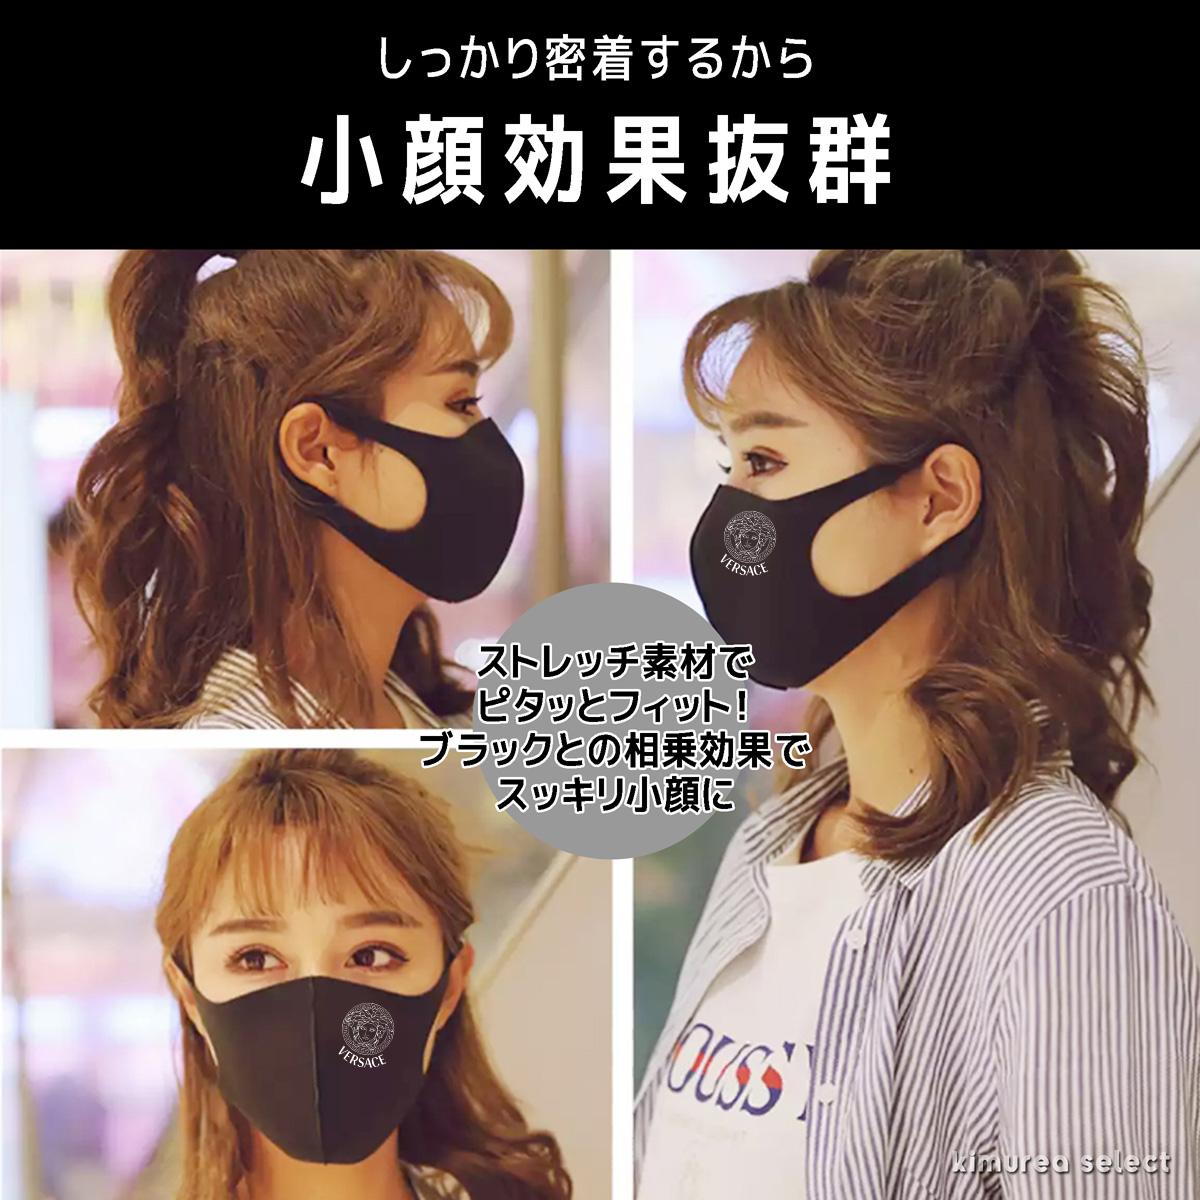 VERSACE brand masks quality reusable cloth dustproof sport masks